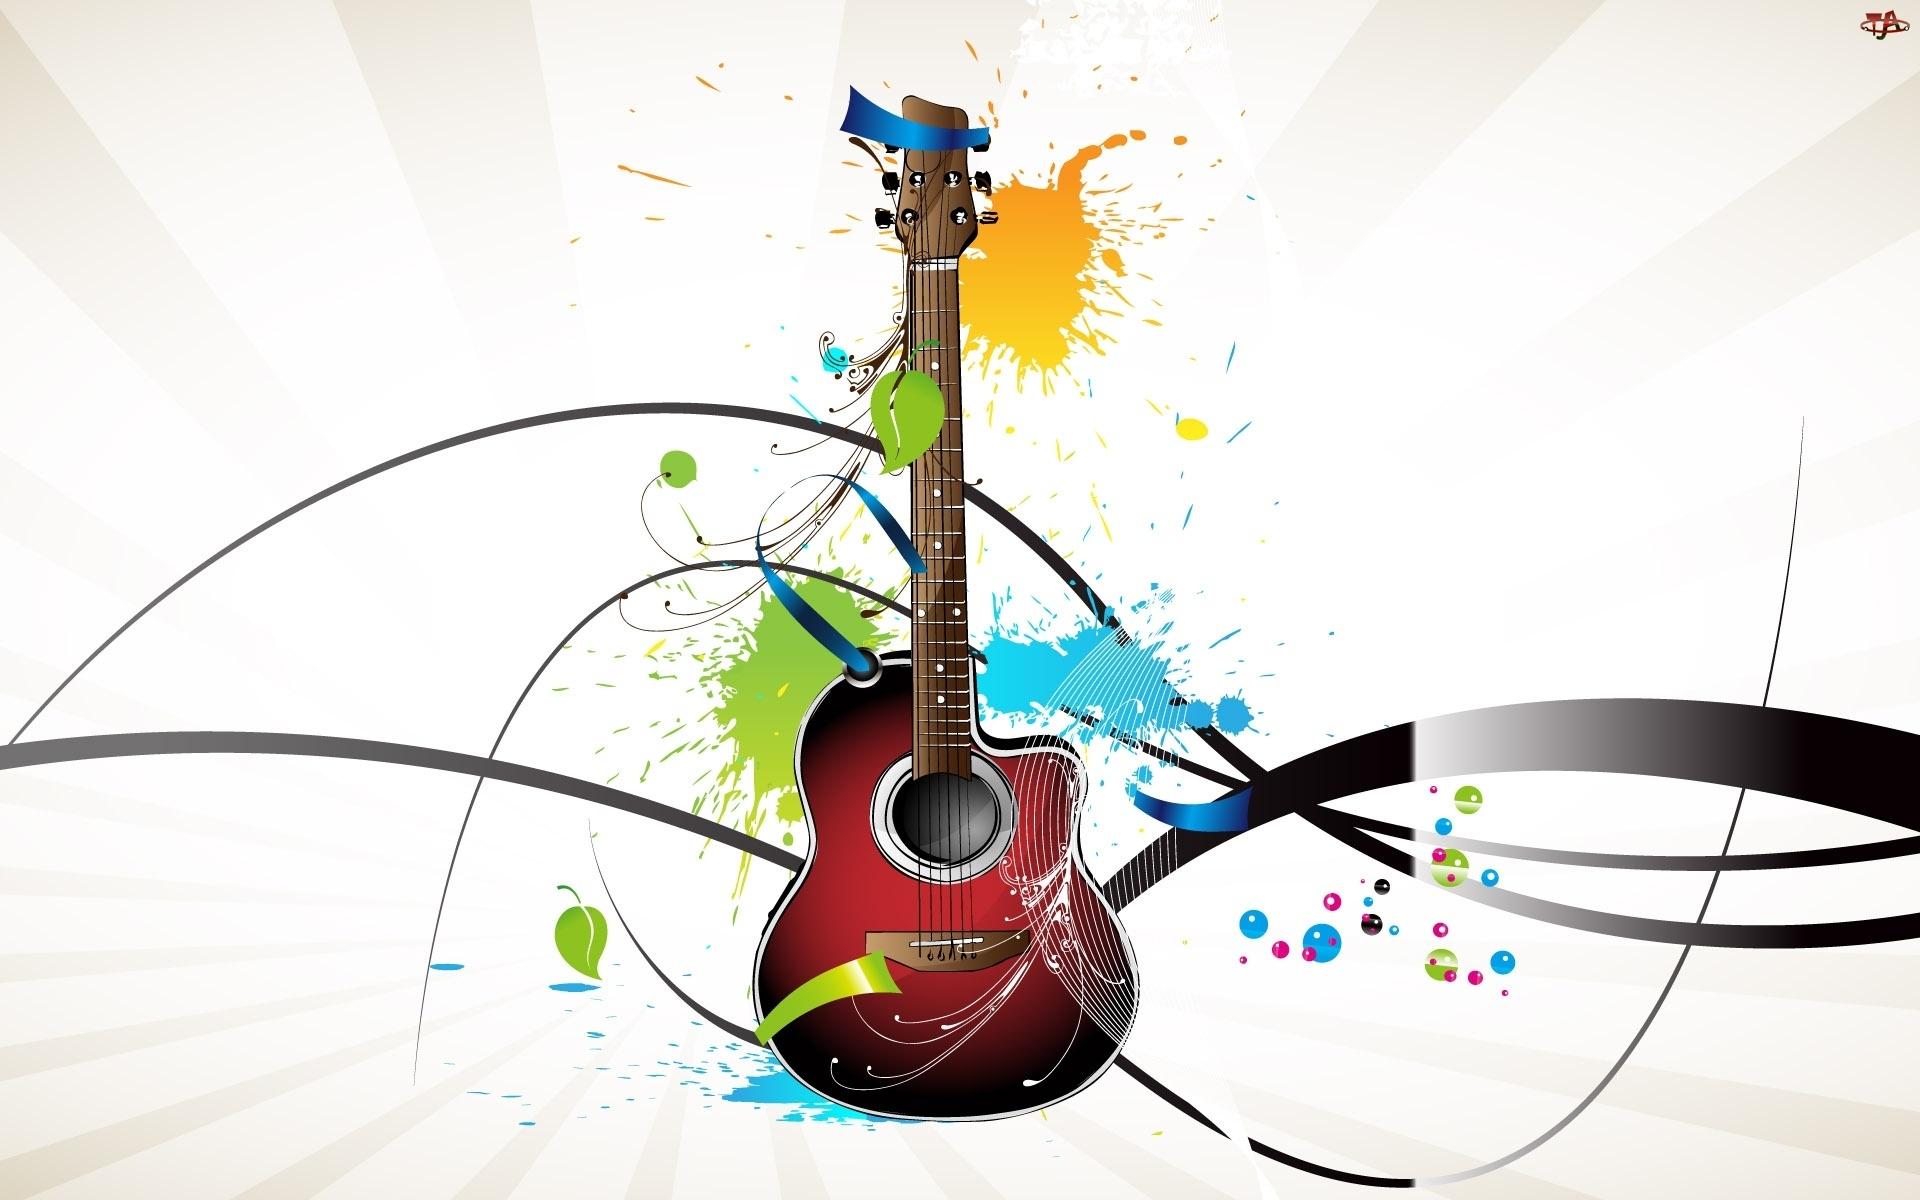 Plamy, Gitara, Kolorowe